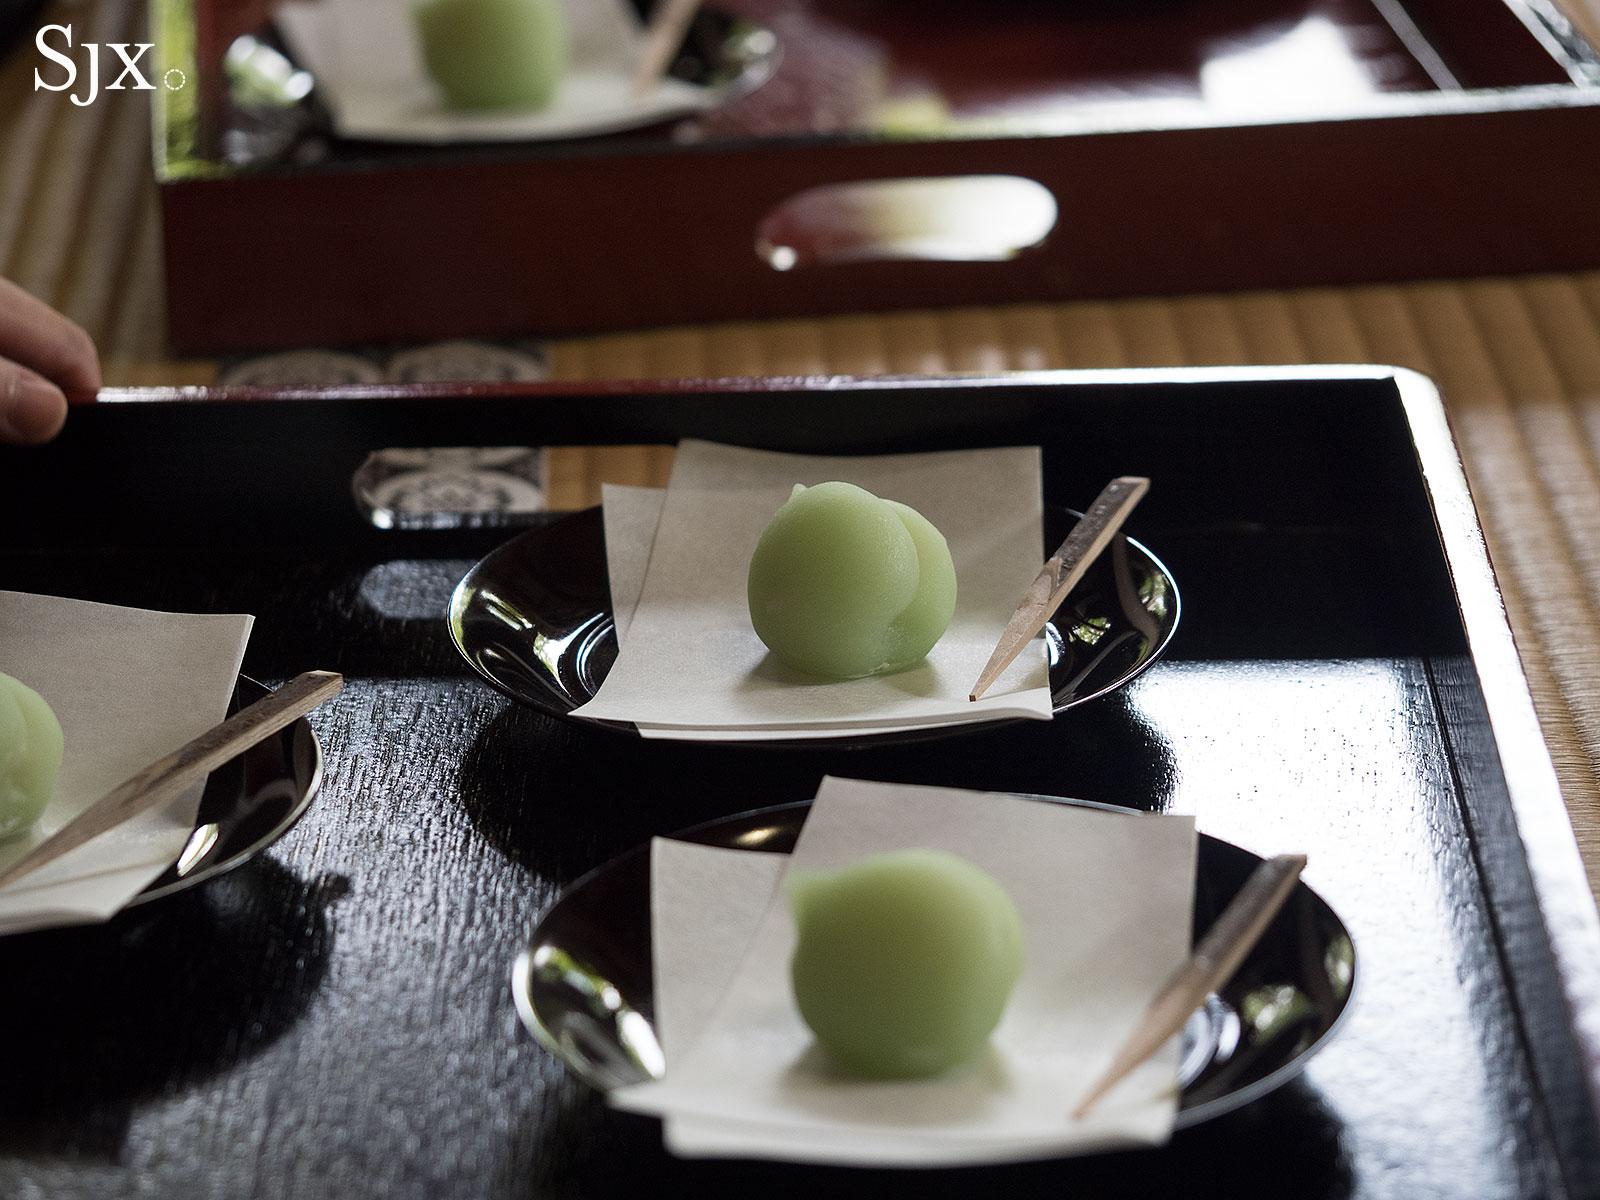 Vacheron Constantin Overseas Tour Kyoto 2016 3